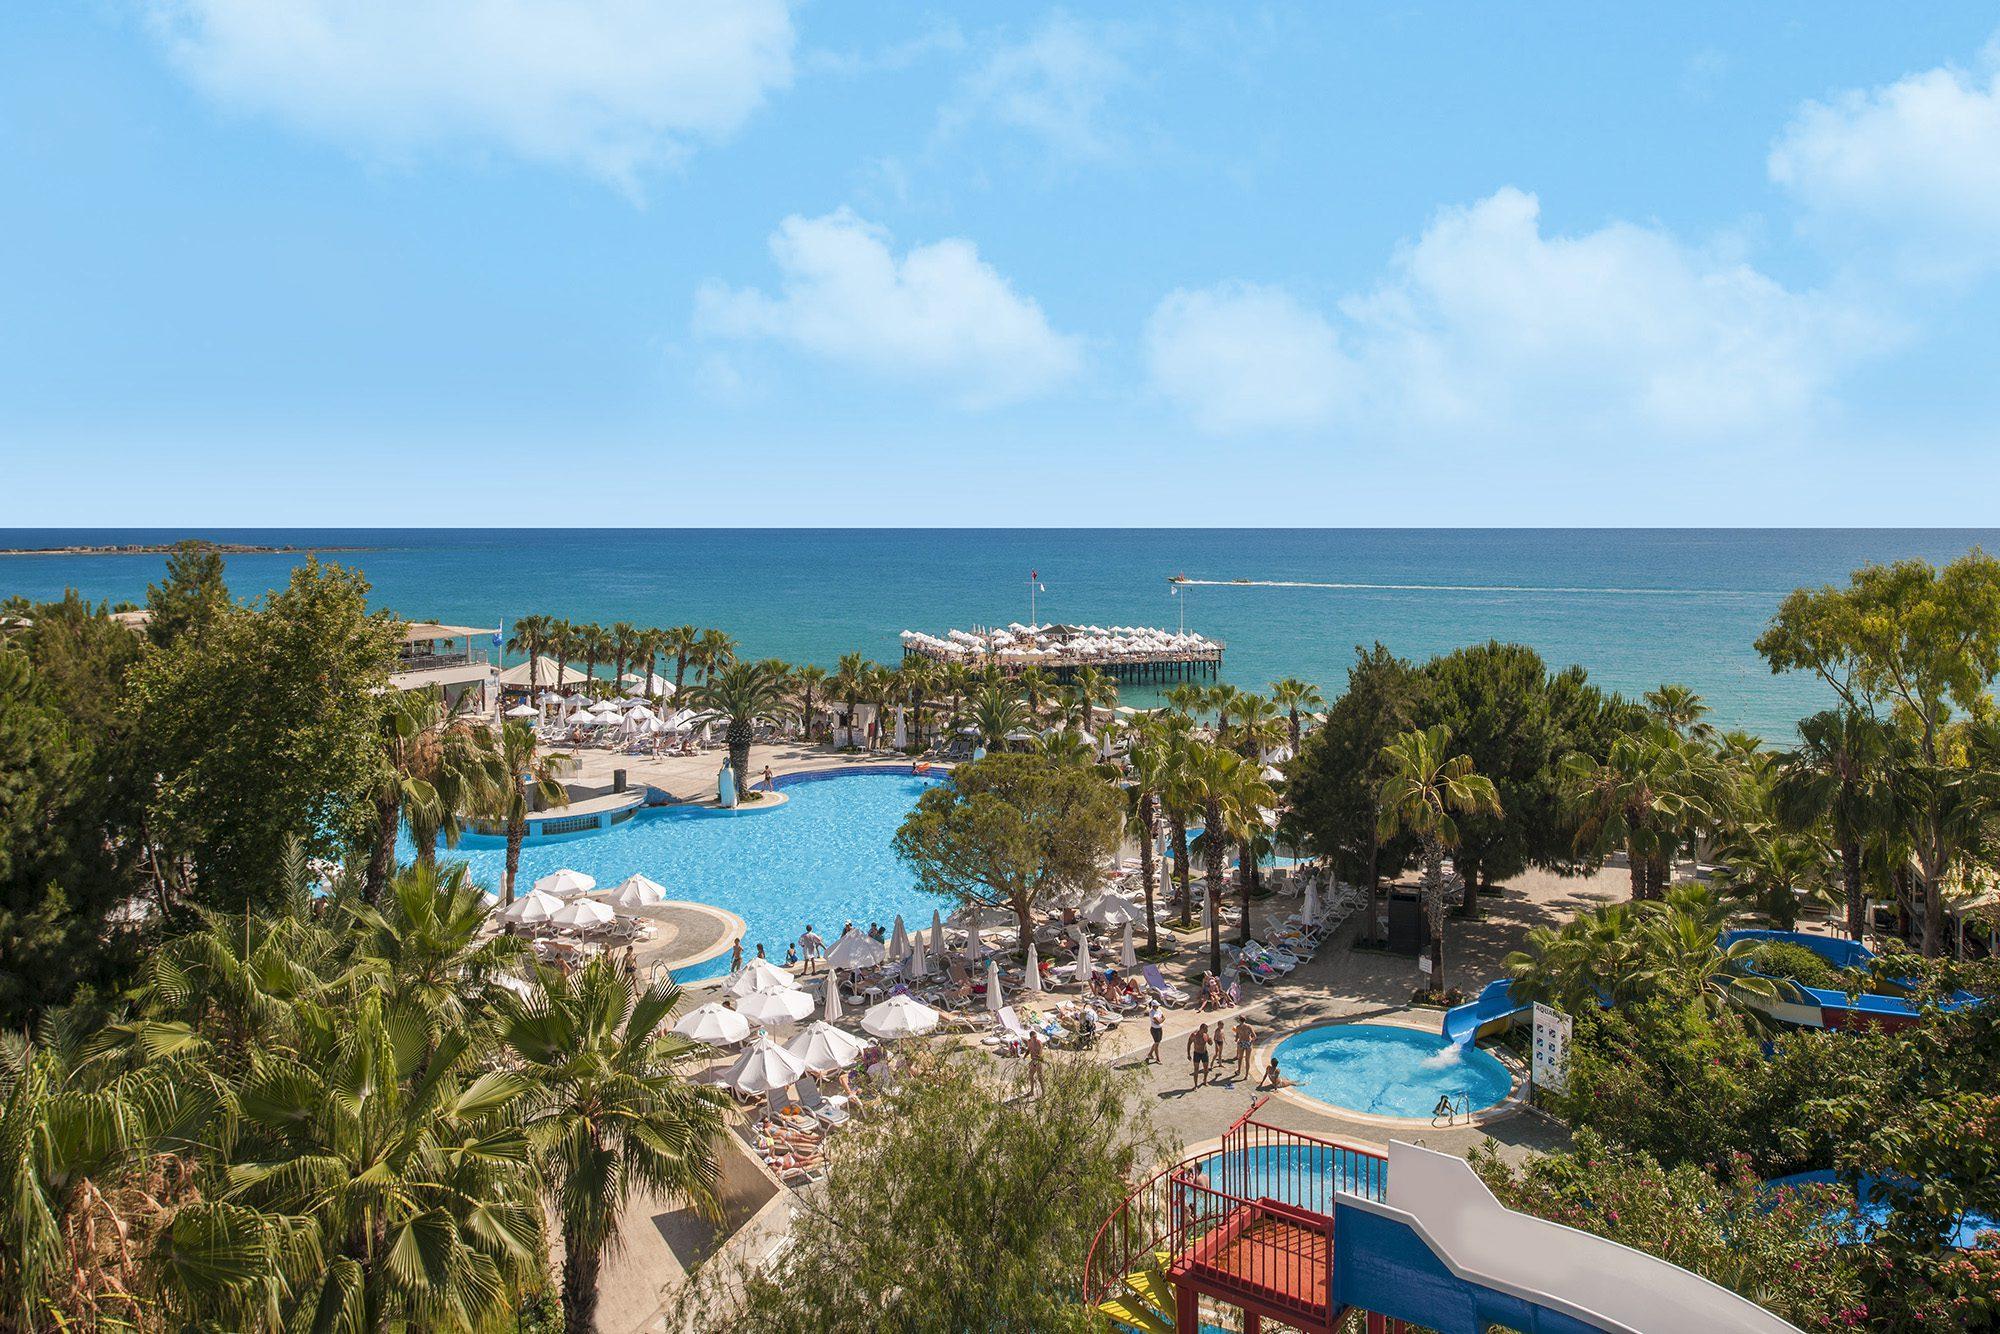 фото Delphin Botanik Hotel & Resort